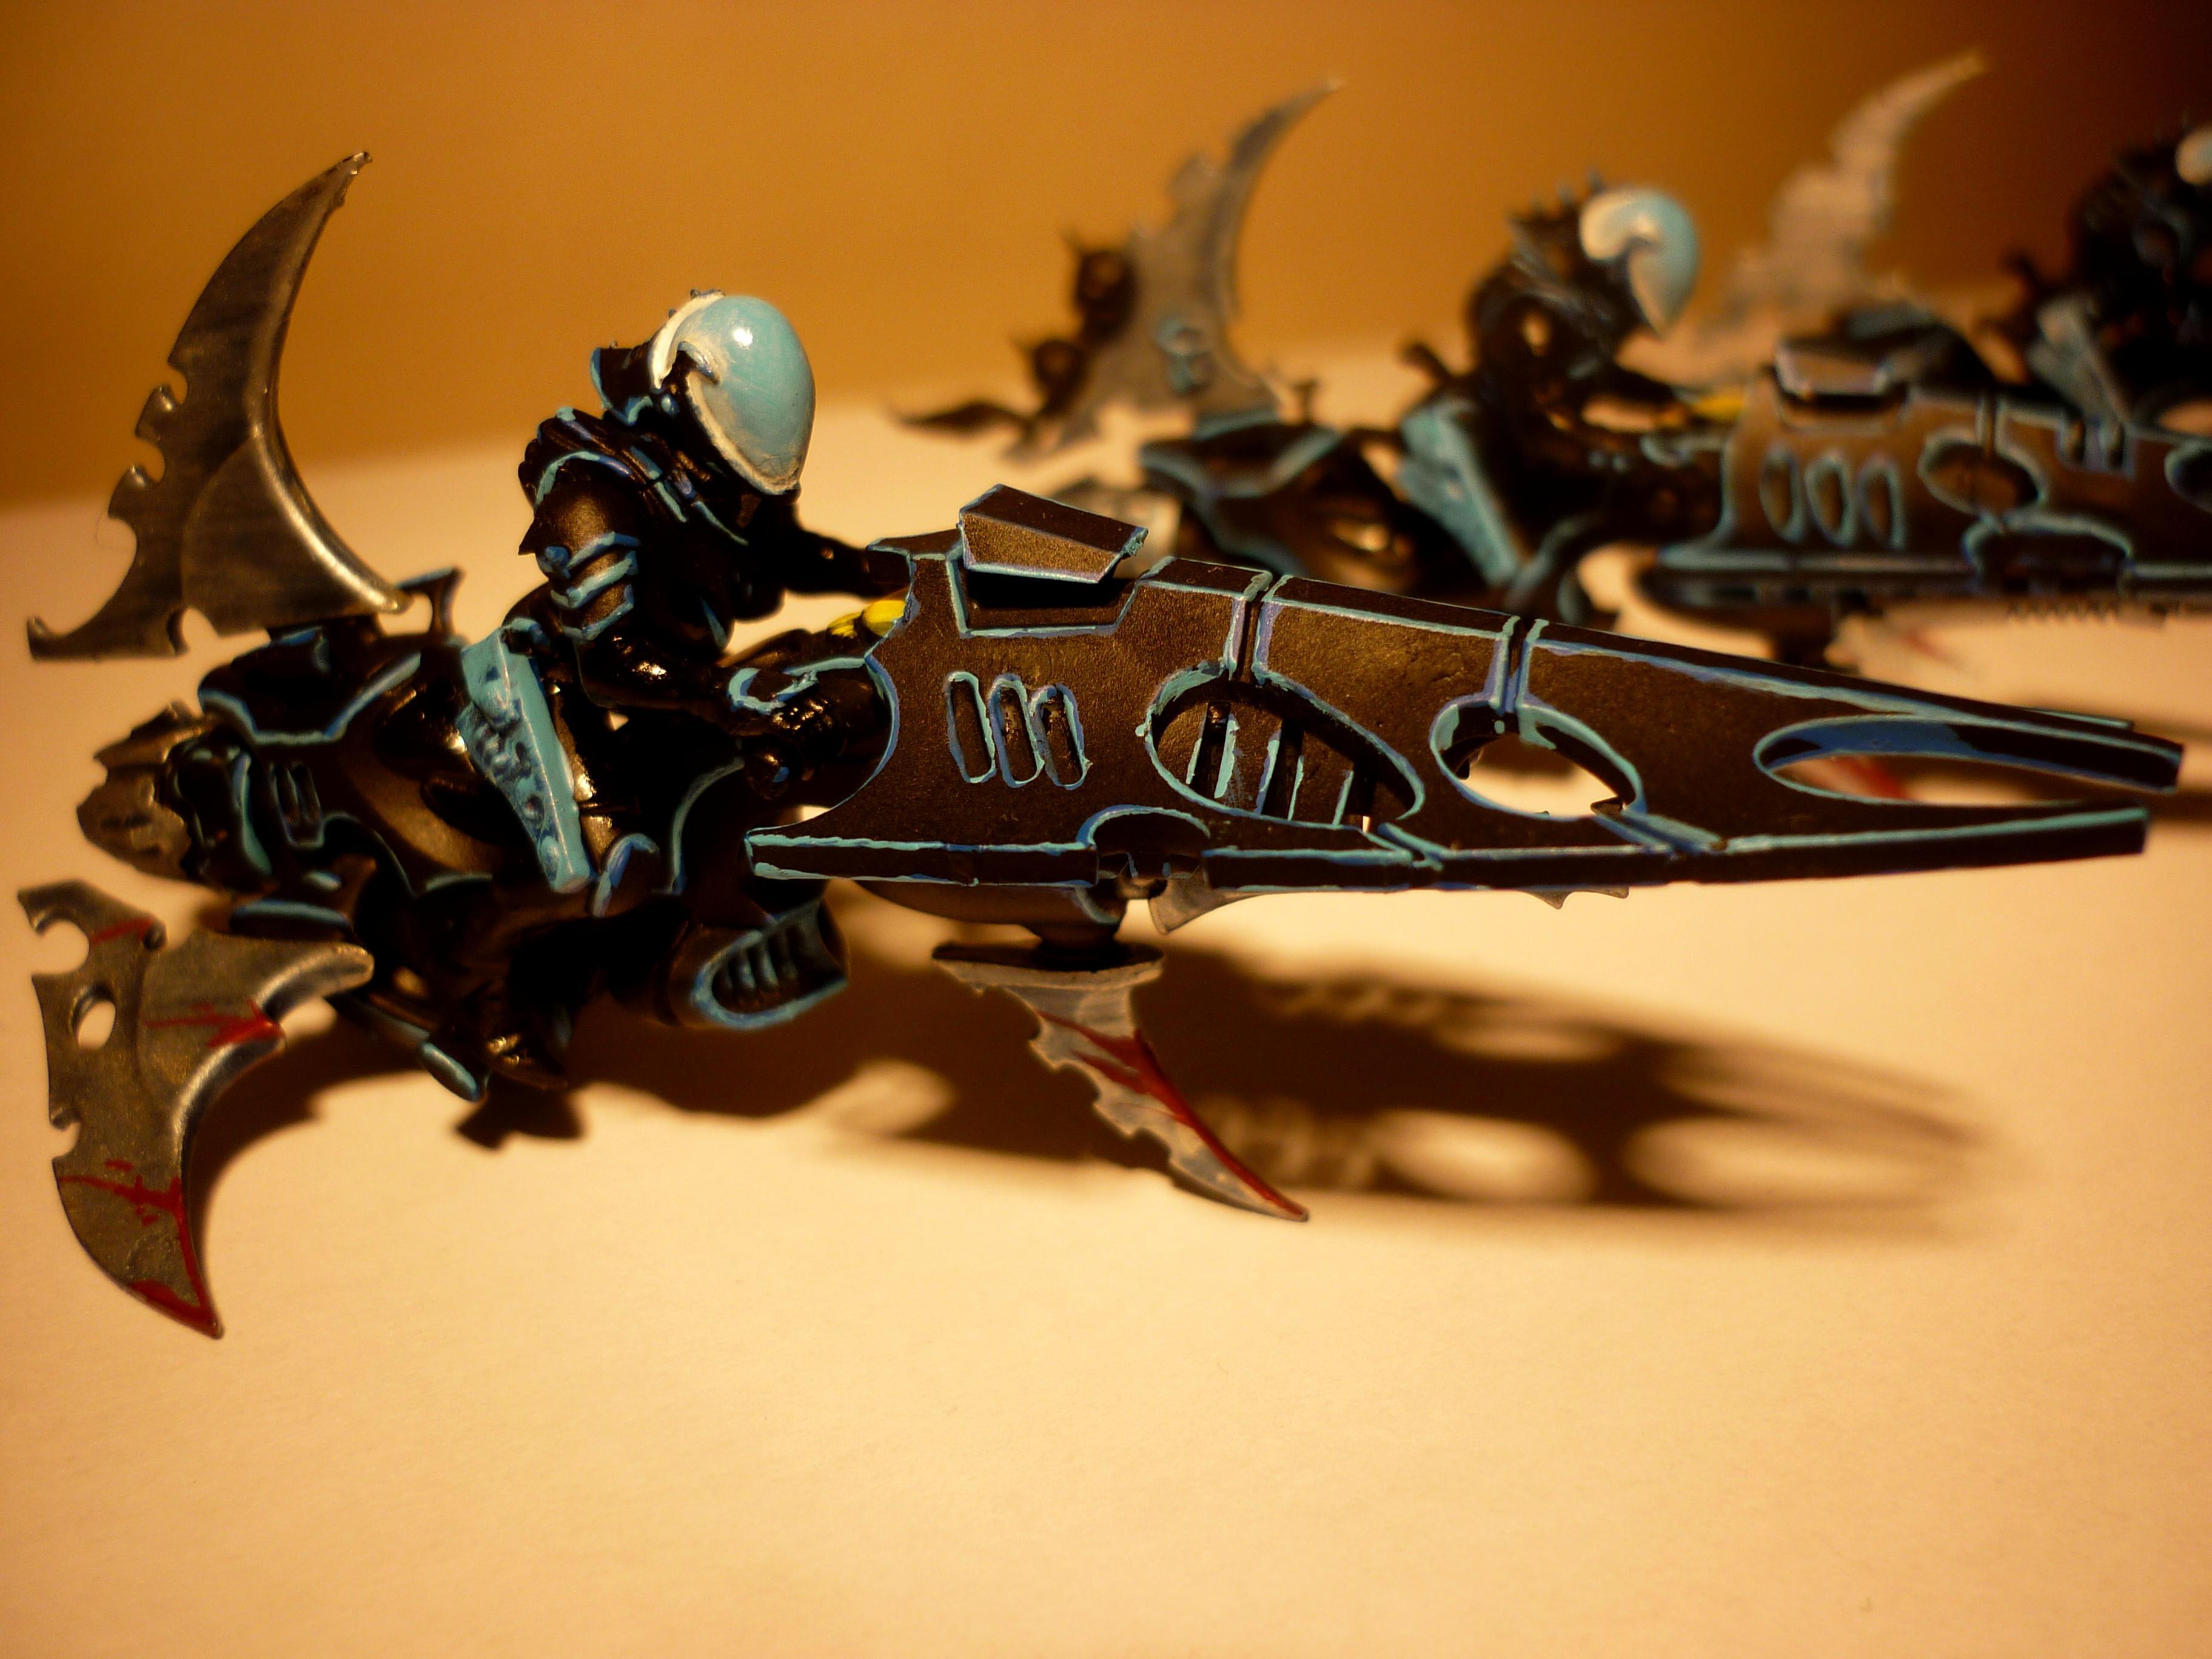 Dark Eldar, Fast Attack, Ice, Jetbike, Reaver, Warhammer 40,000